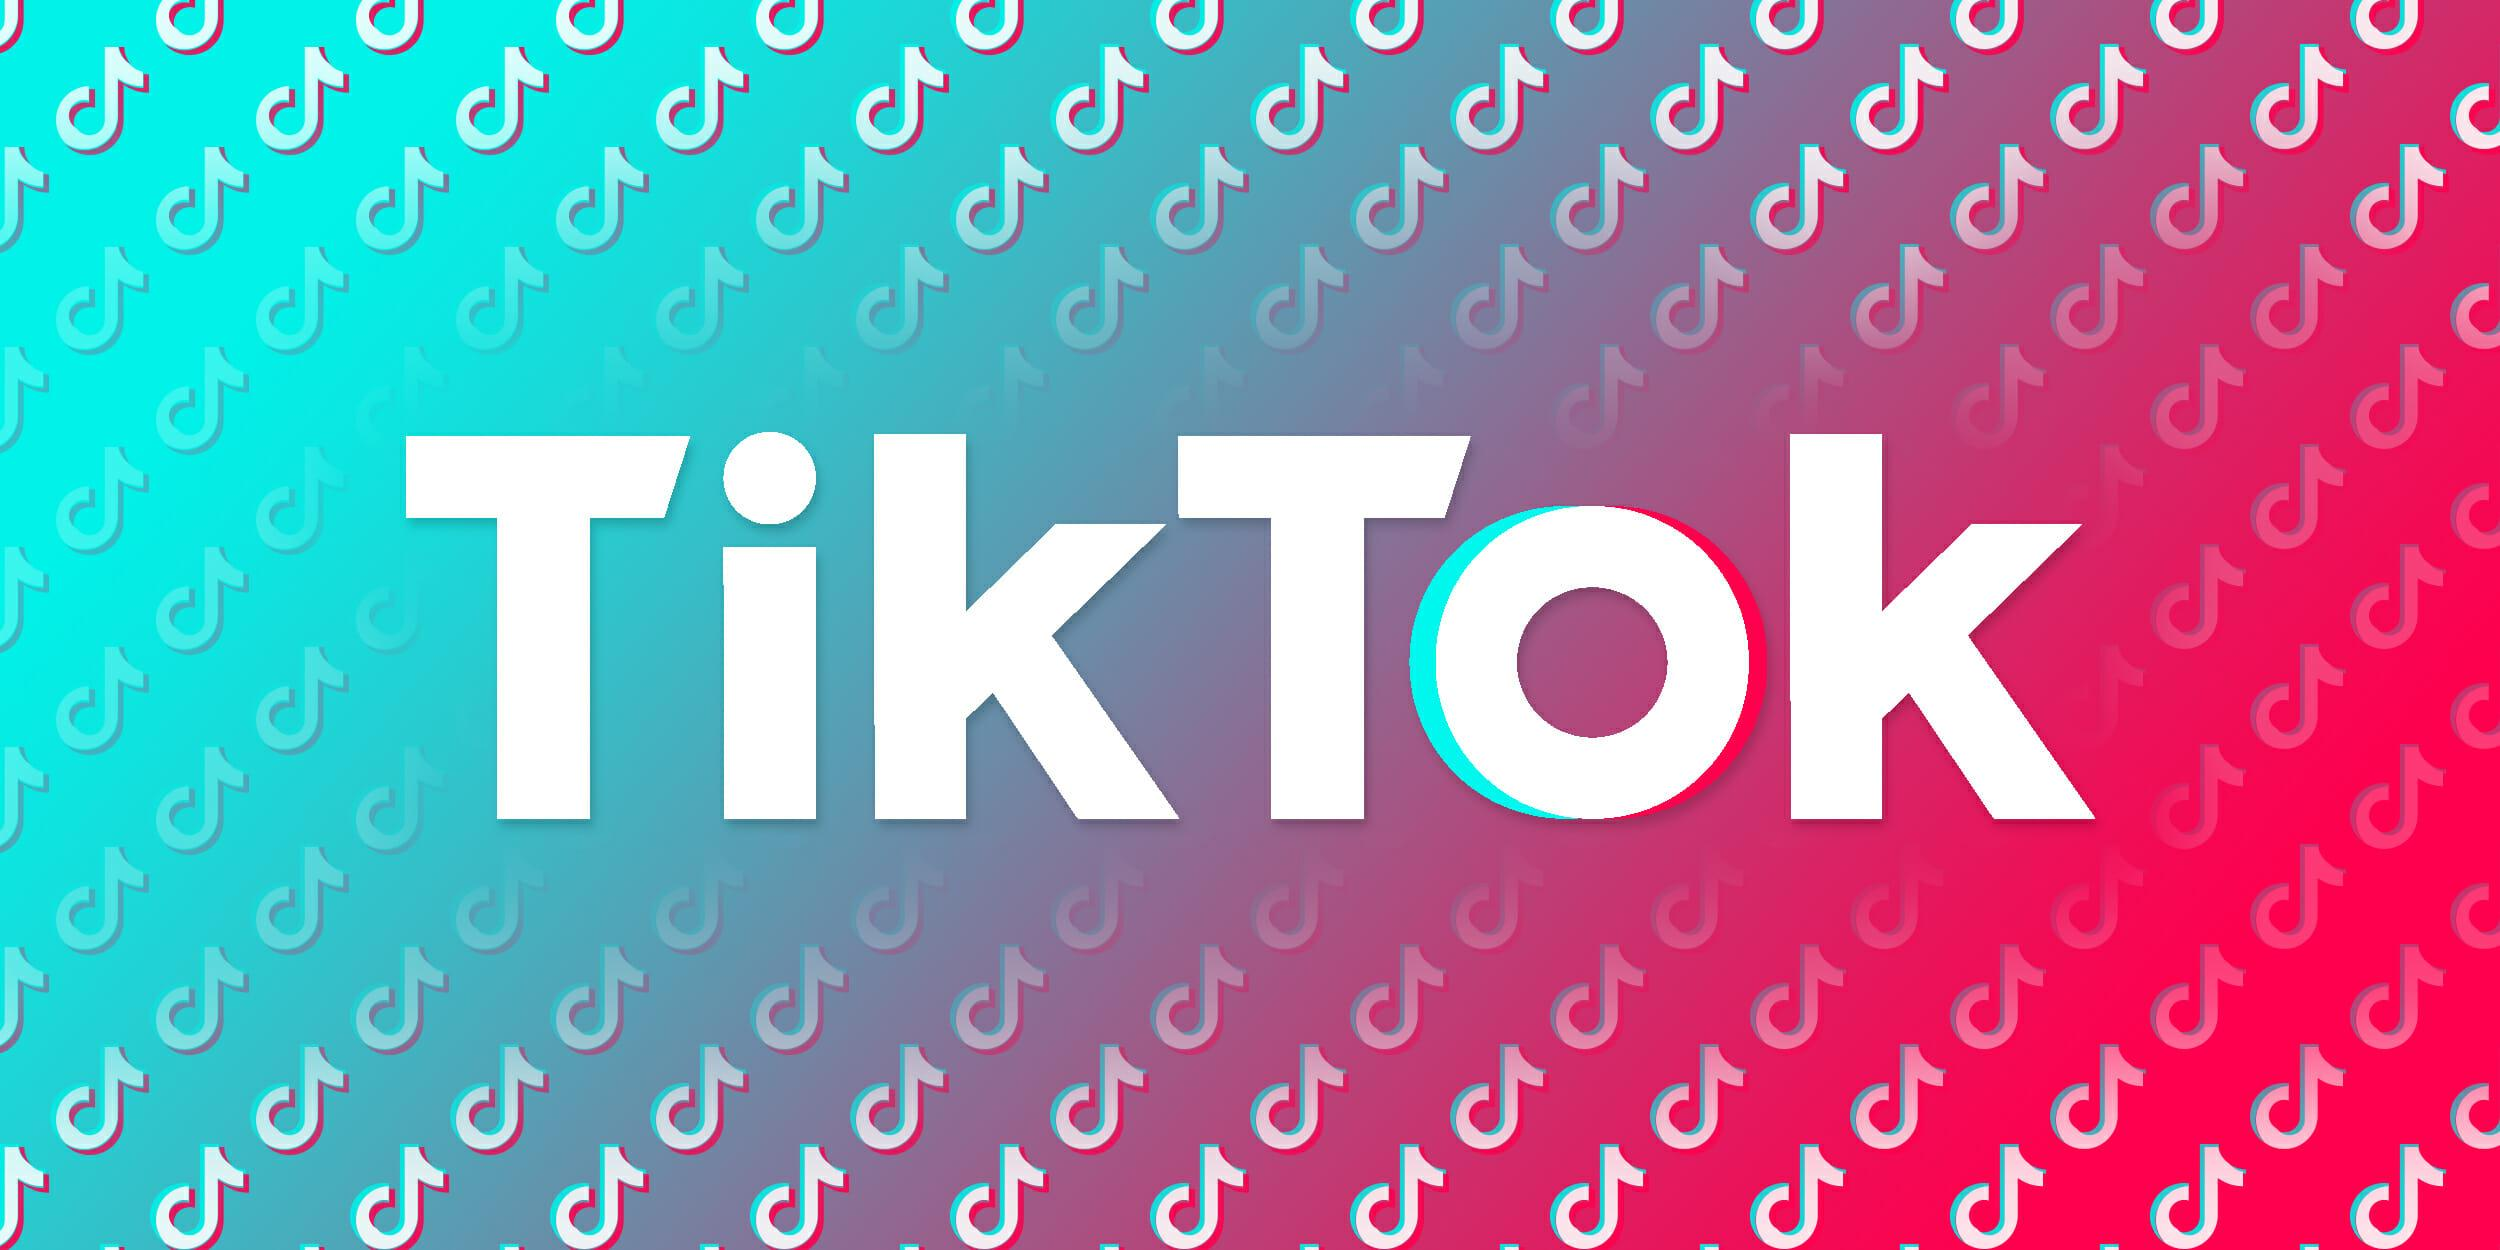 One fad to the next: TikTok